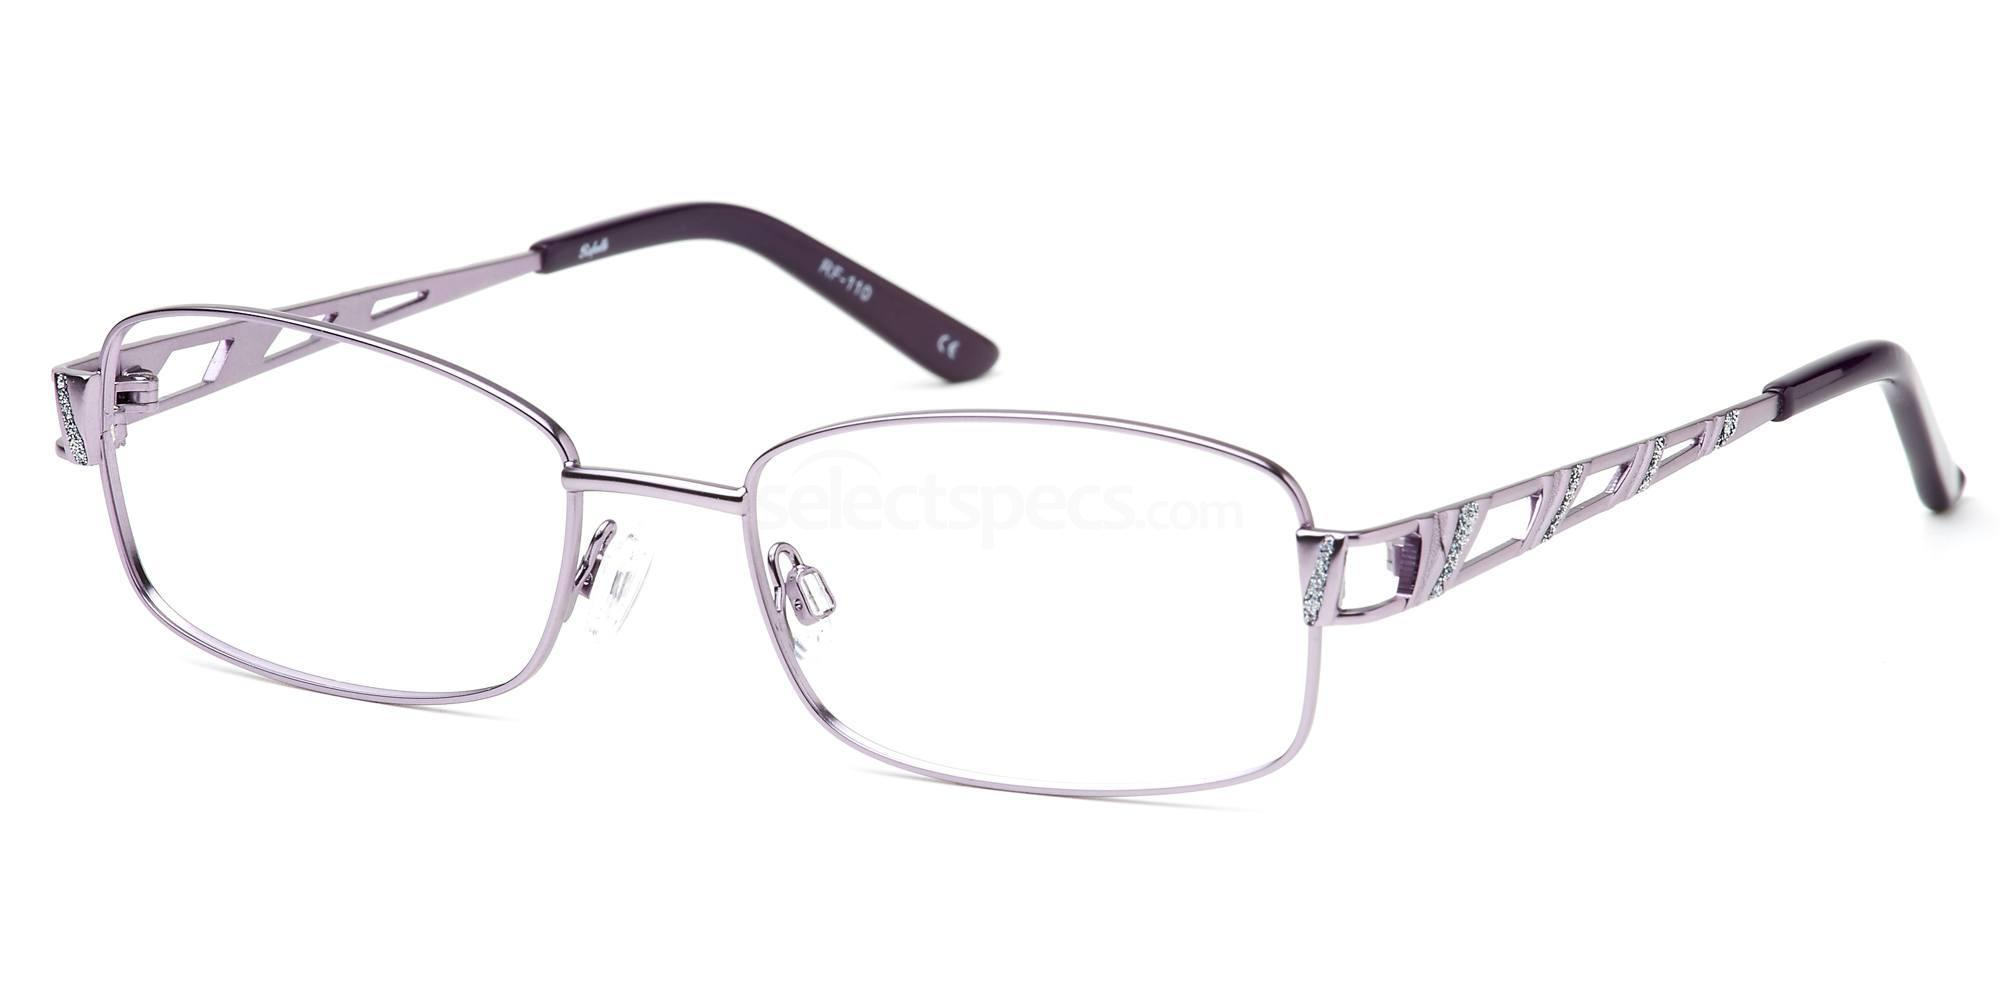 C1 RAF110 Glasses, Rafaelle